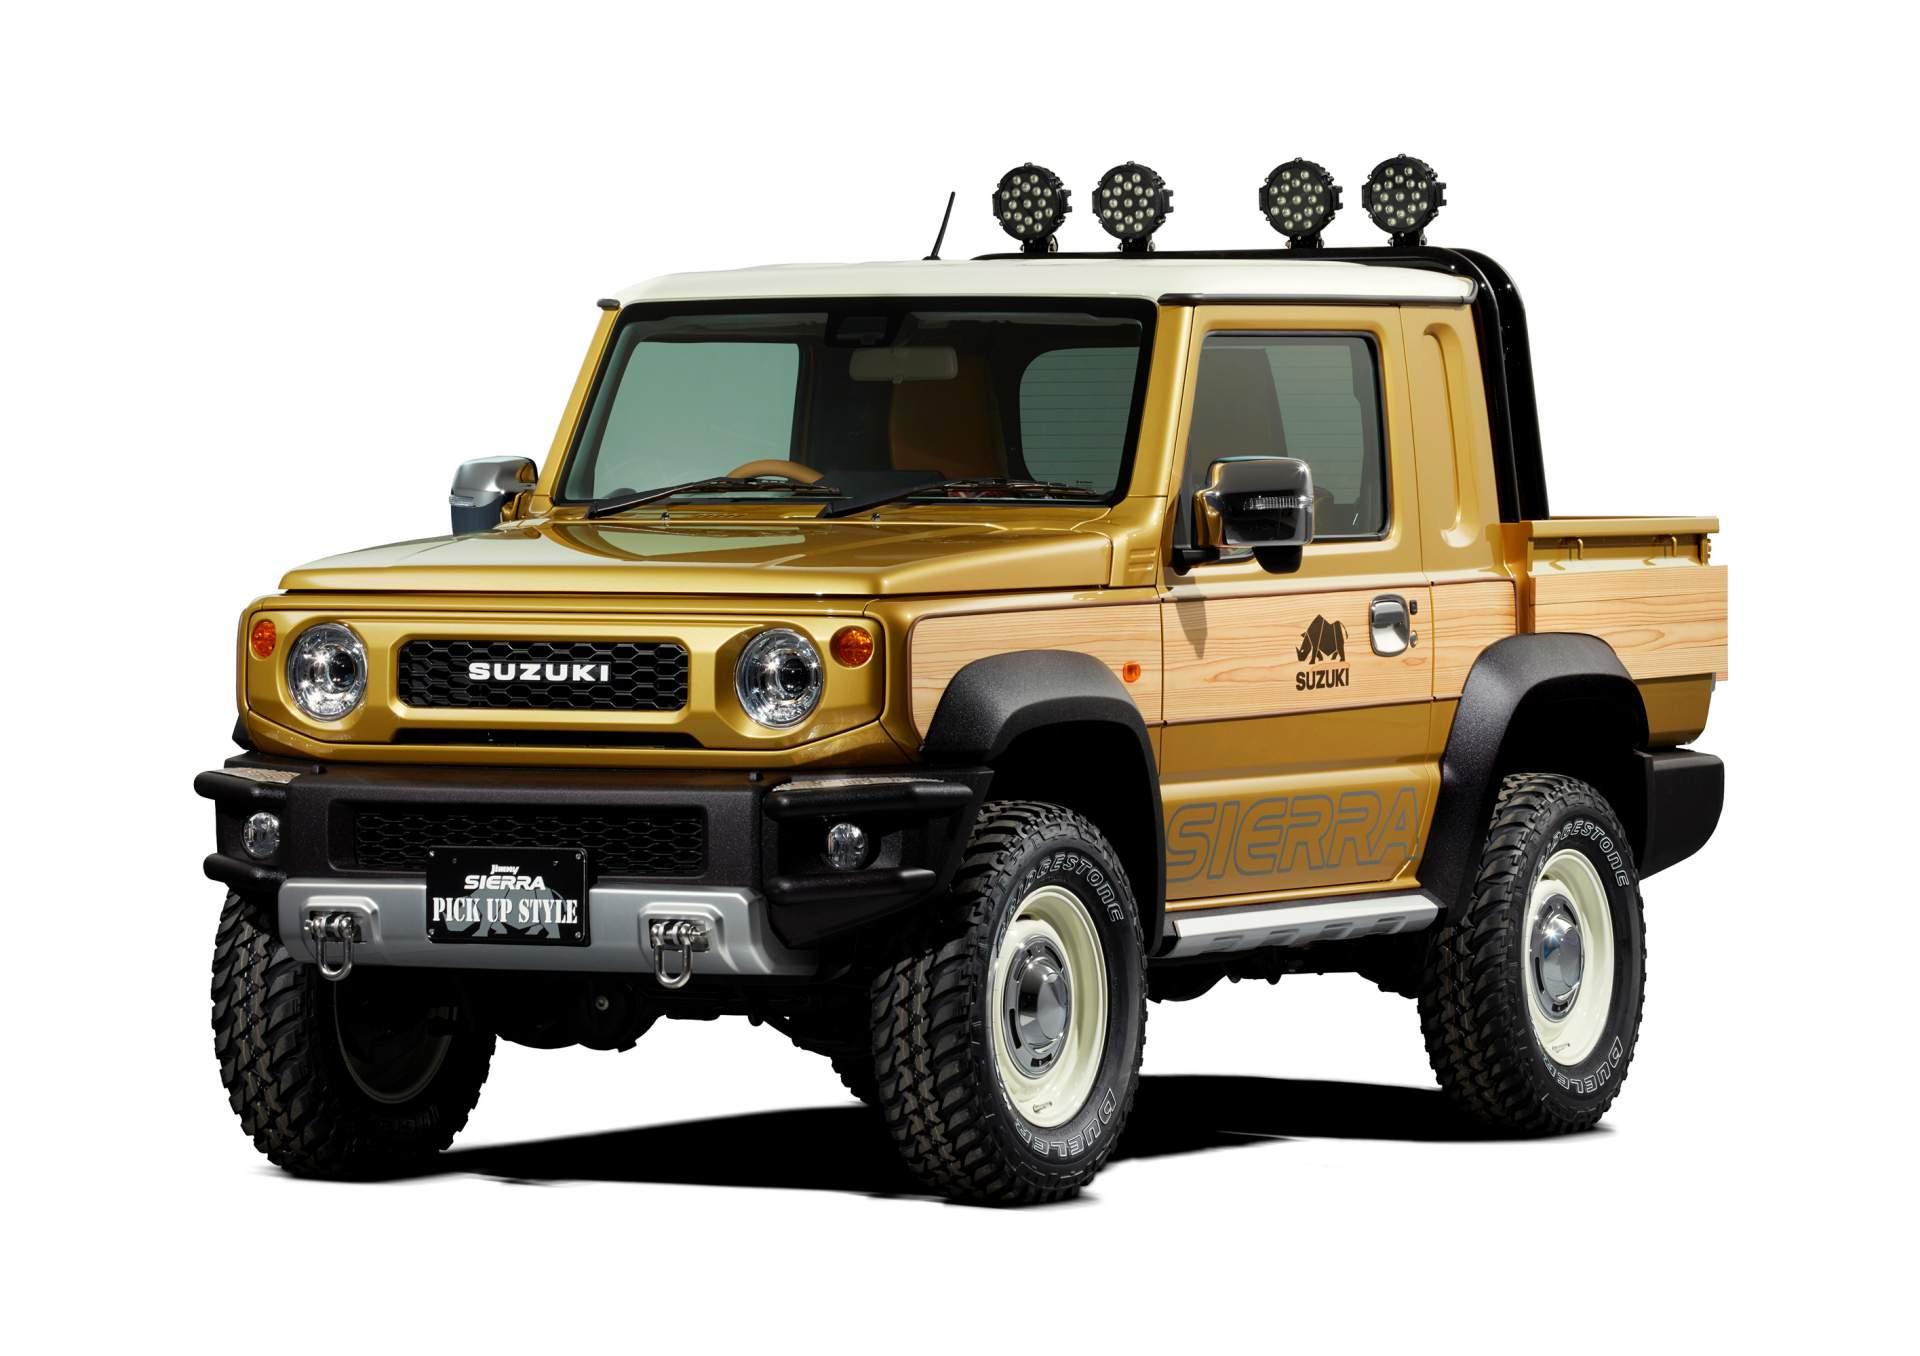 2019 Suzuki Jimny Turned Into Pickup Truck For Tokyo Auto ...